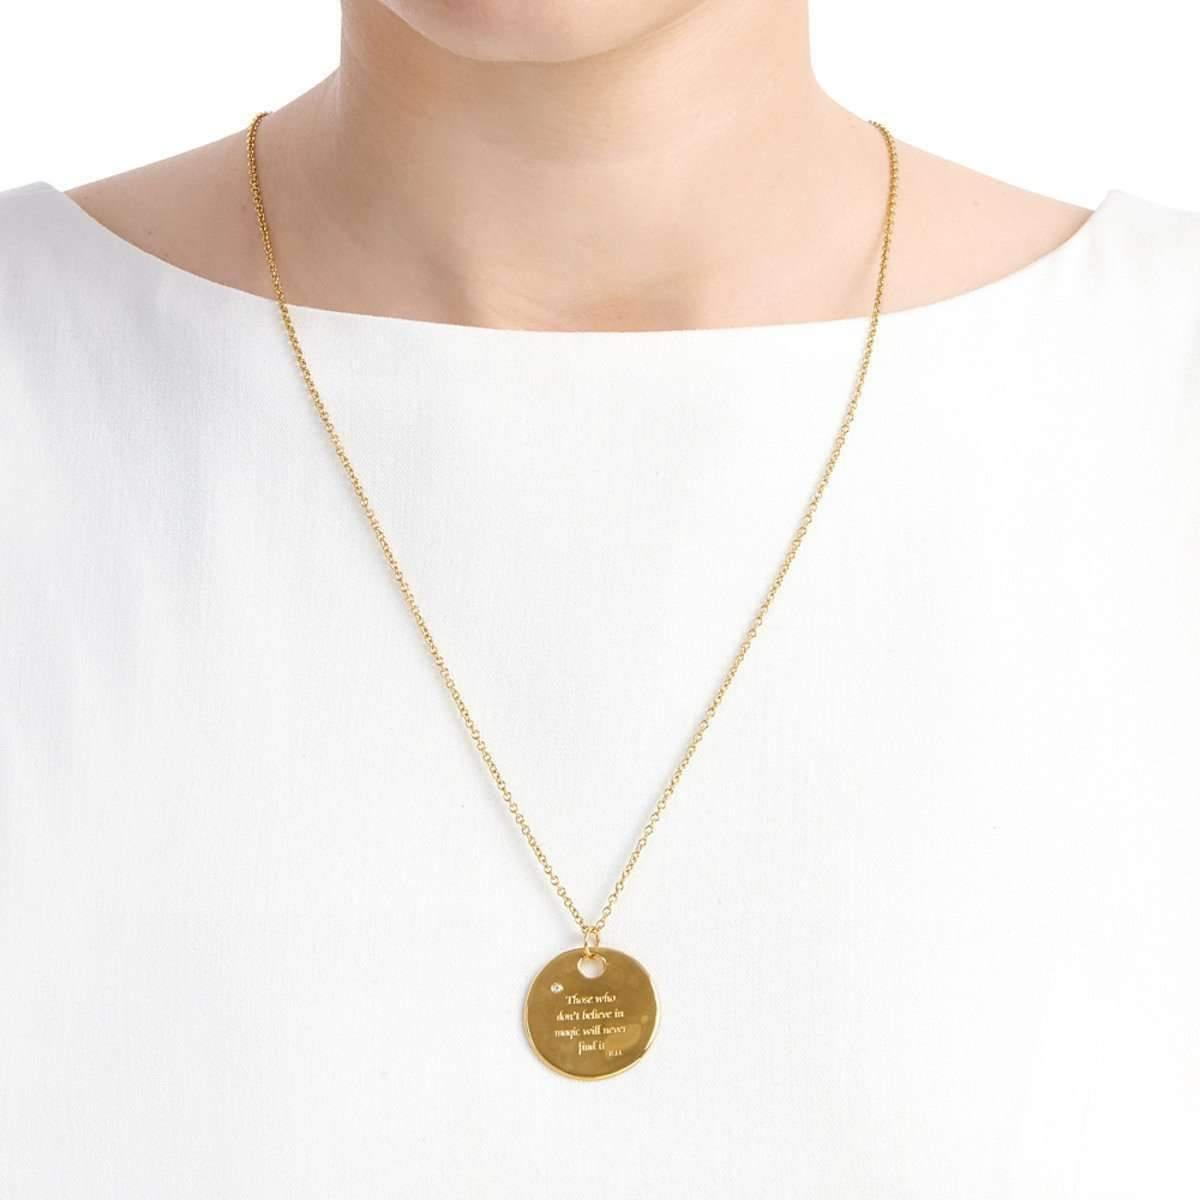 Roald Dahl necklace